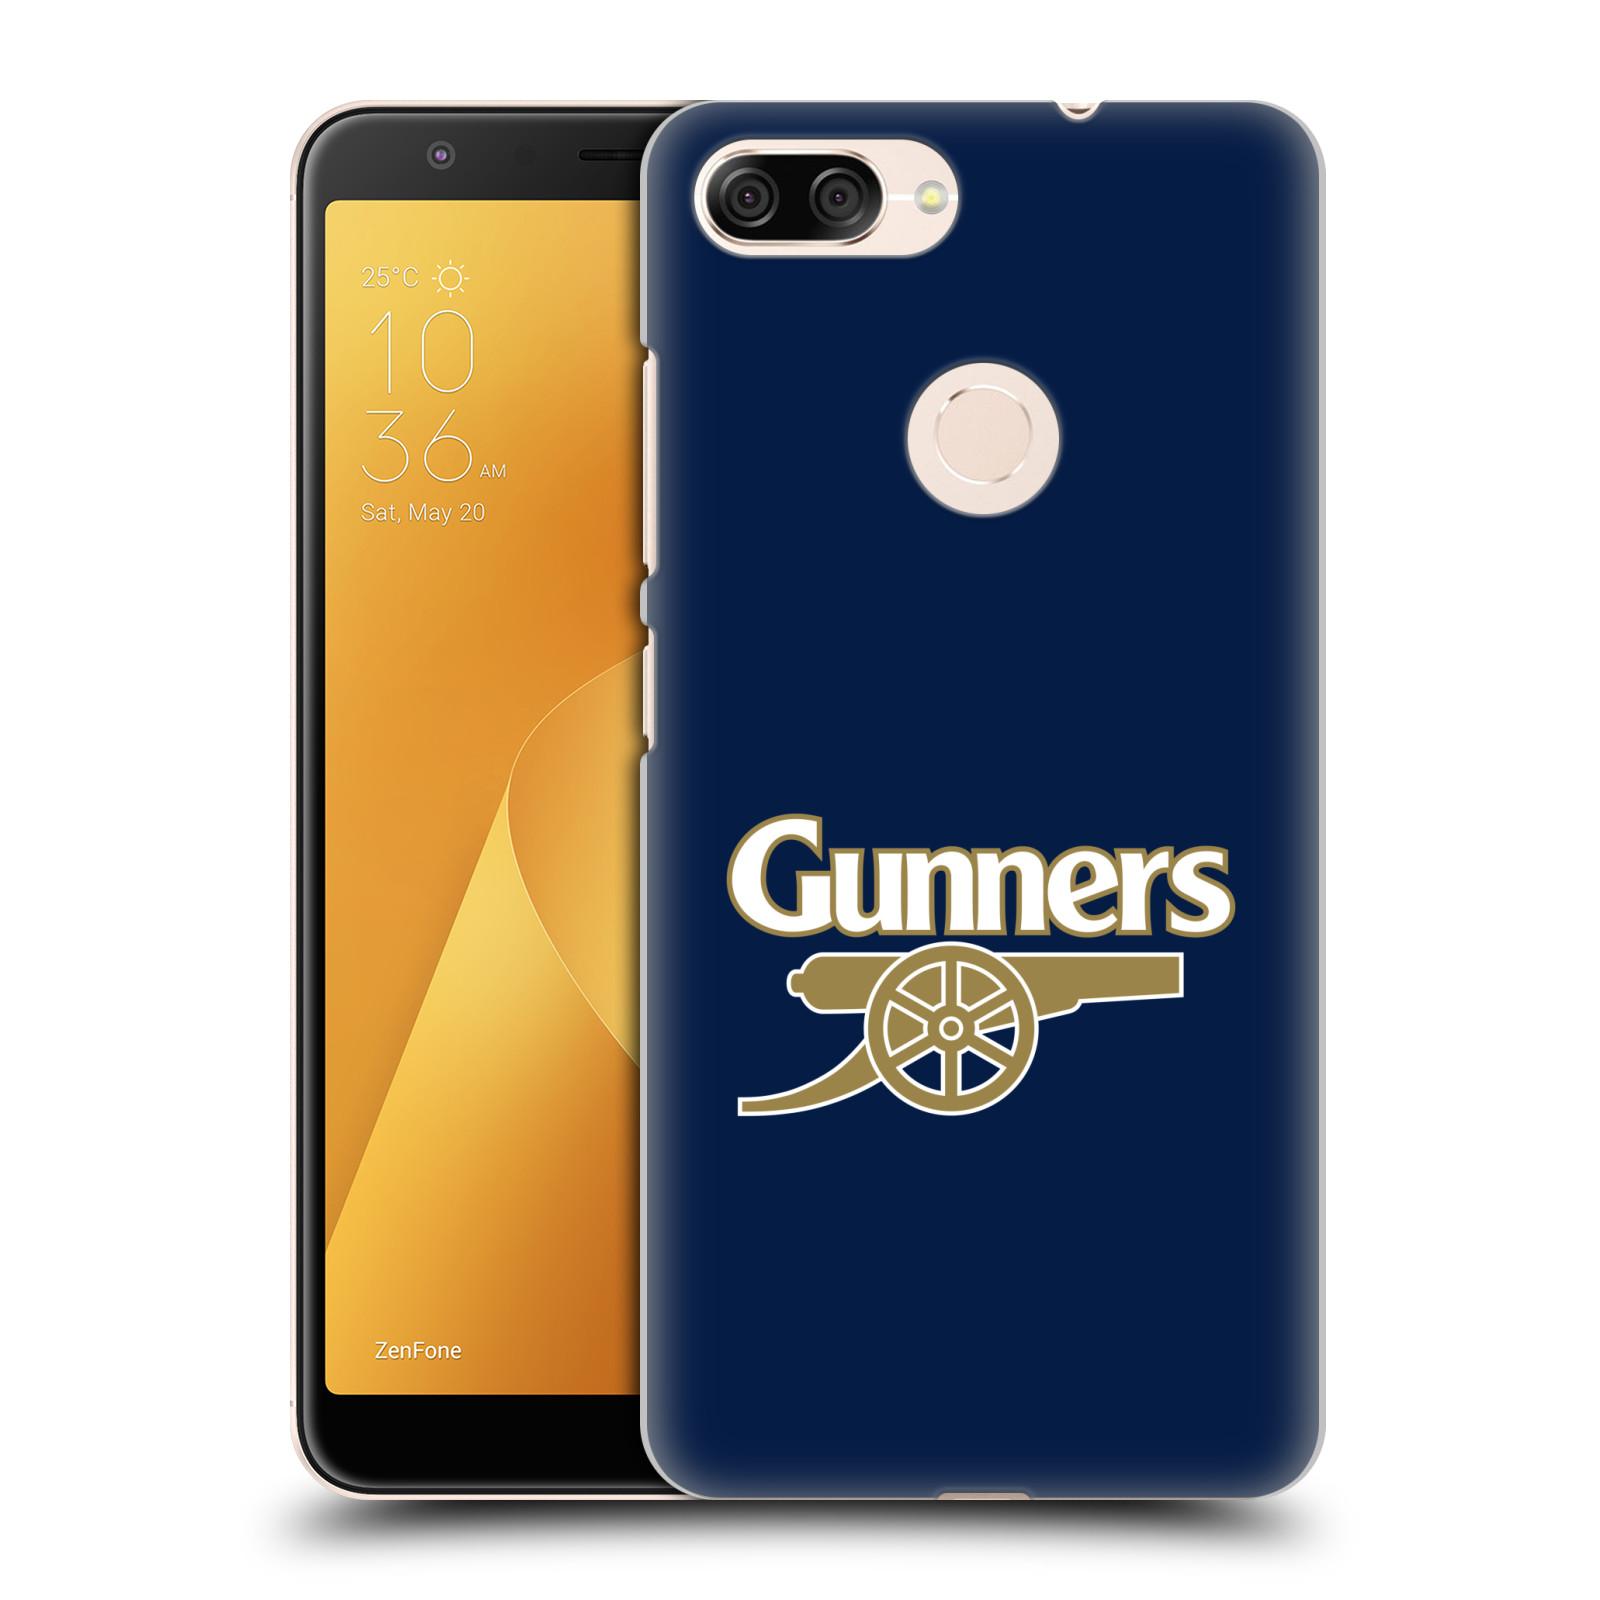 Plastové pouzdro na mobil Asus ZenFone Max Plus (M1) - Head Case - Arsenal FC - Gunners